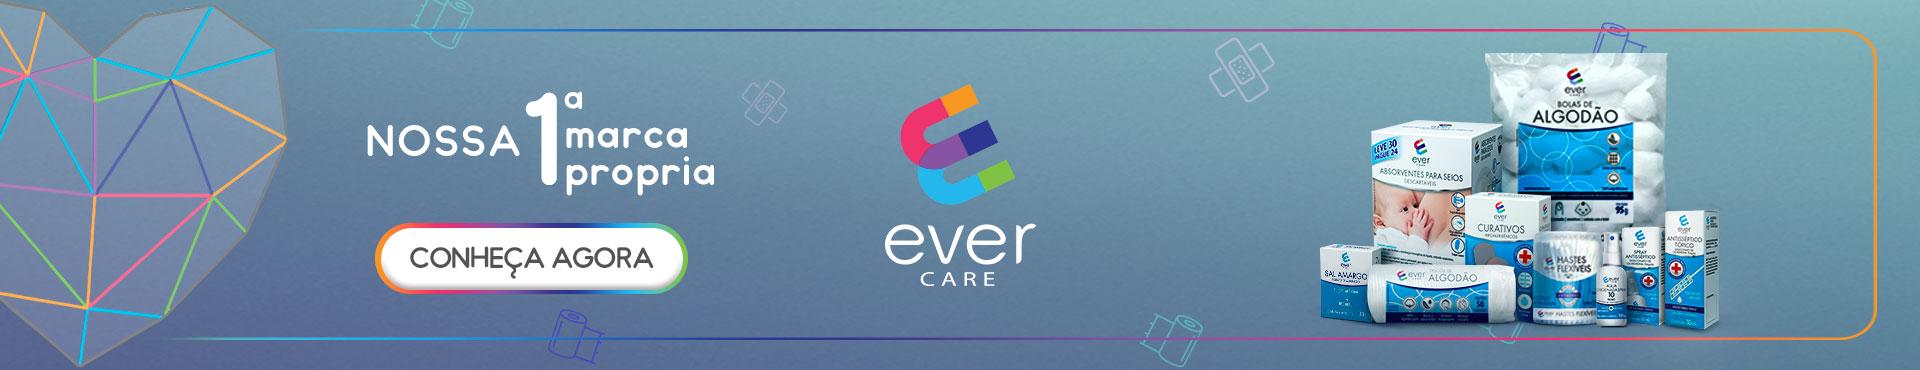 EVER CARE